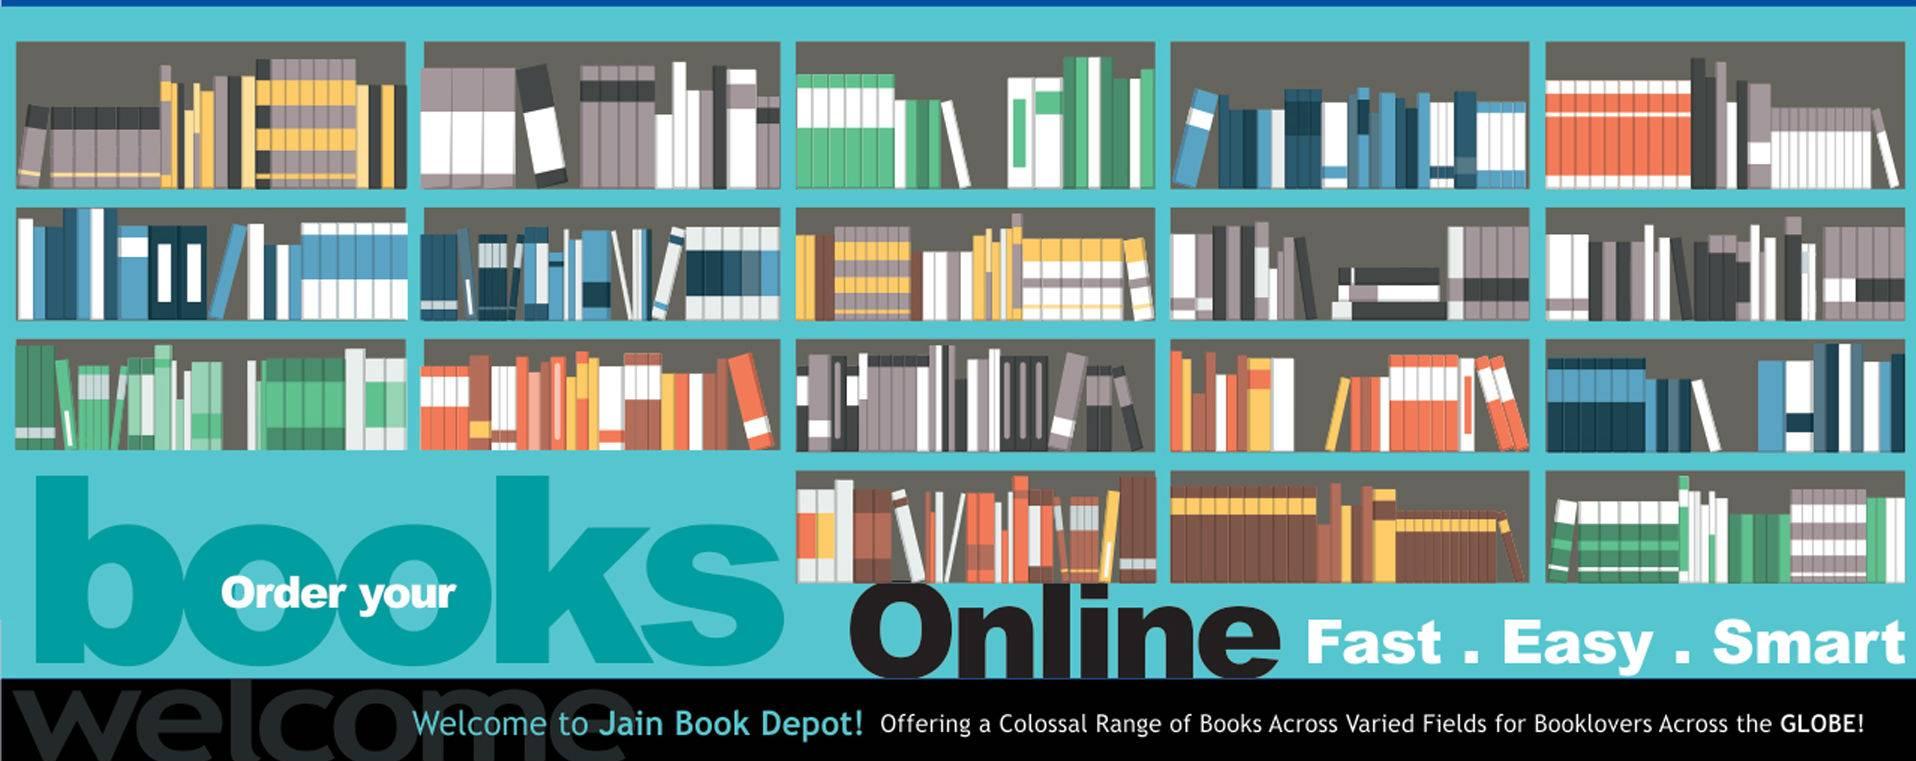 Jain Book Depot : Delhi Law Books Store, Bookshop law books